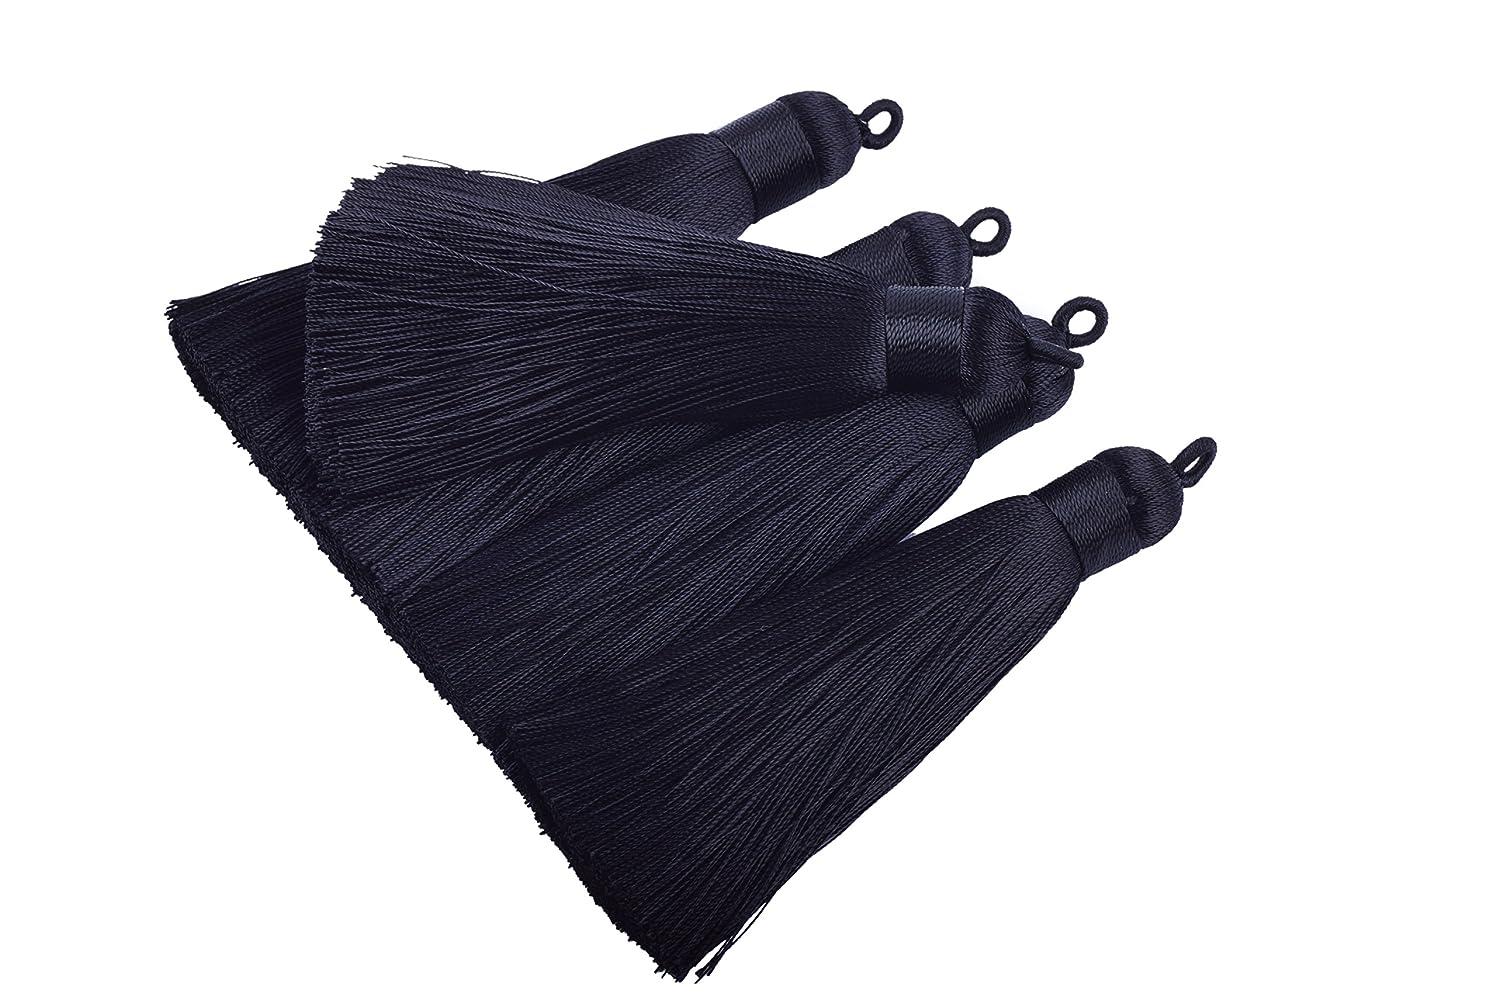 Konmay 10pcs 3.4''(8.5cm) Handmade Imitation Silk Tassels with Hanging Loop for Jewelry Making (Black)